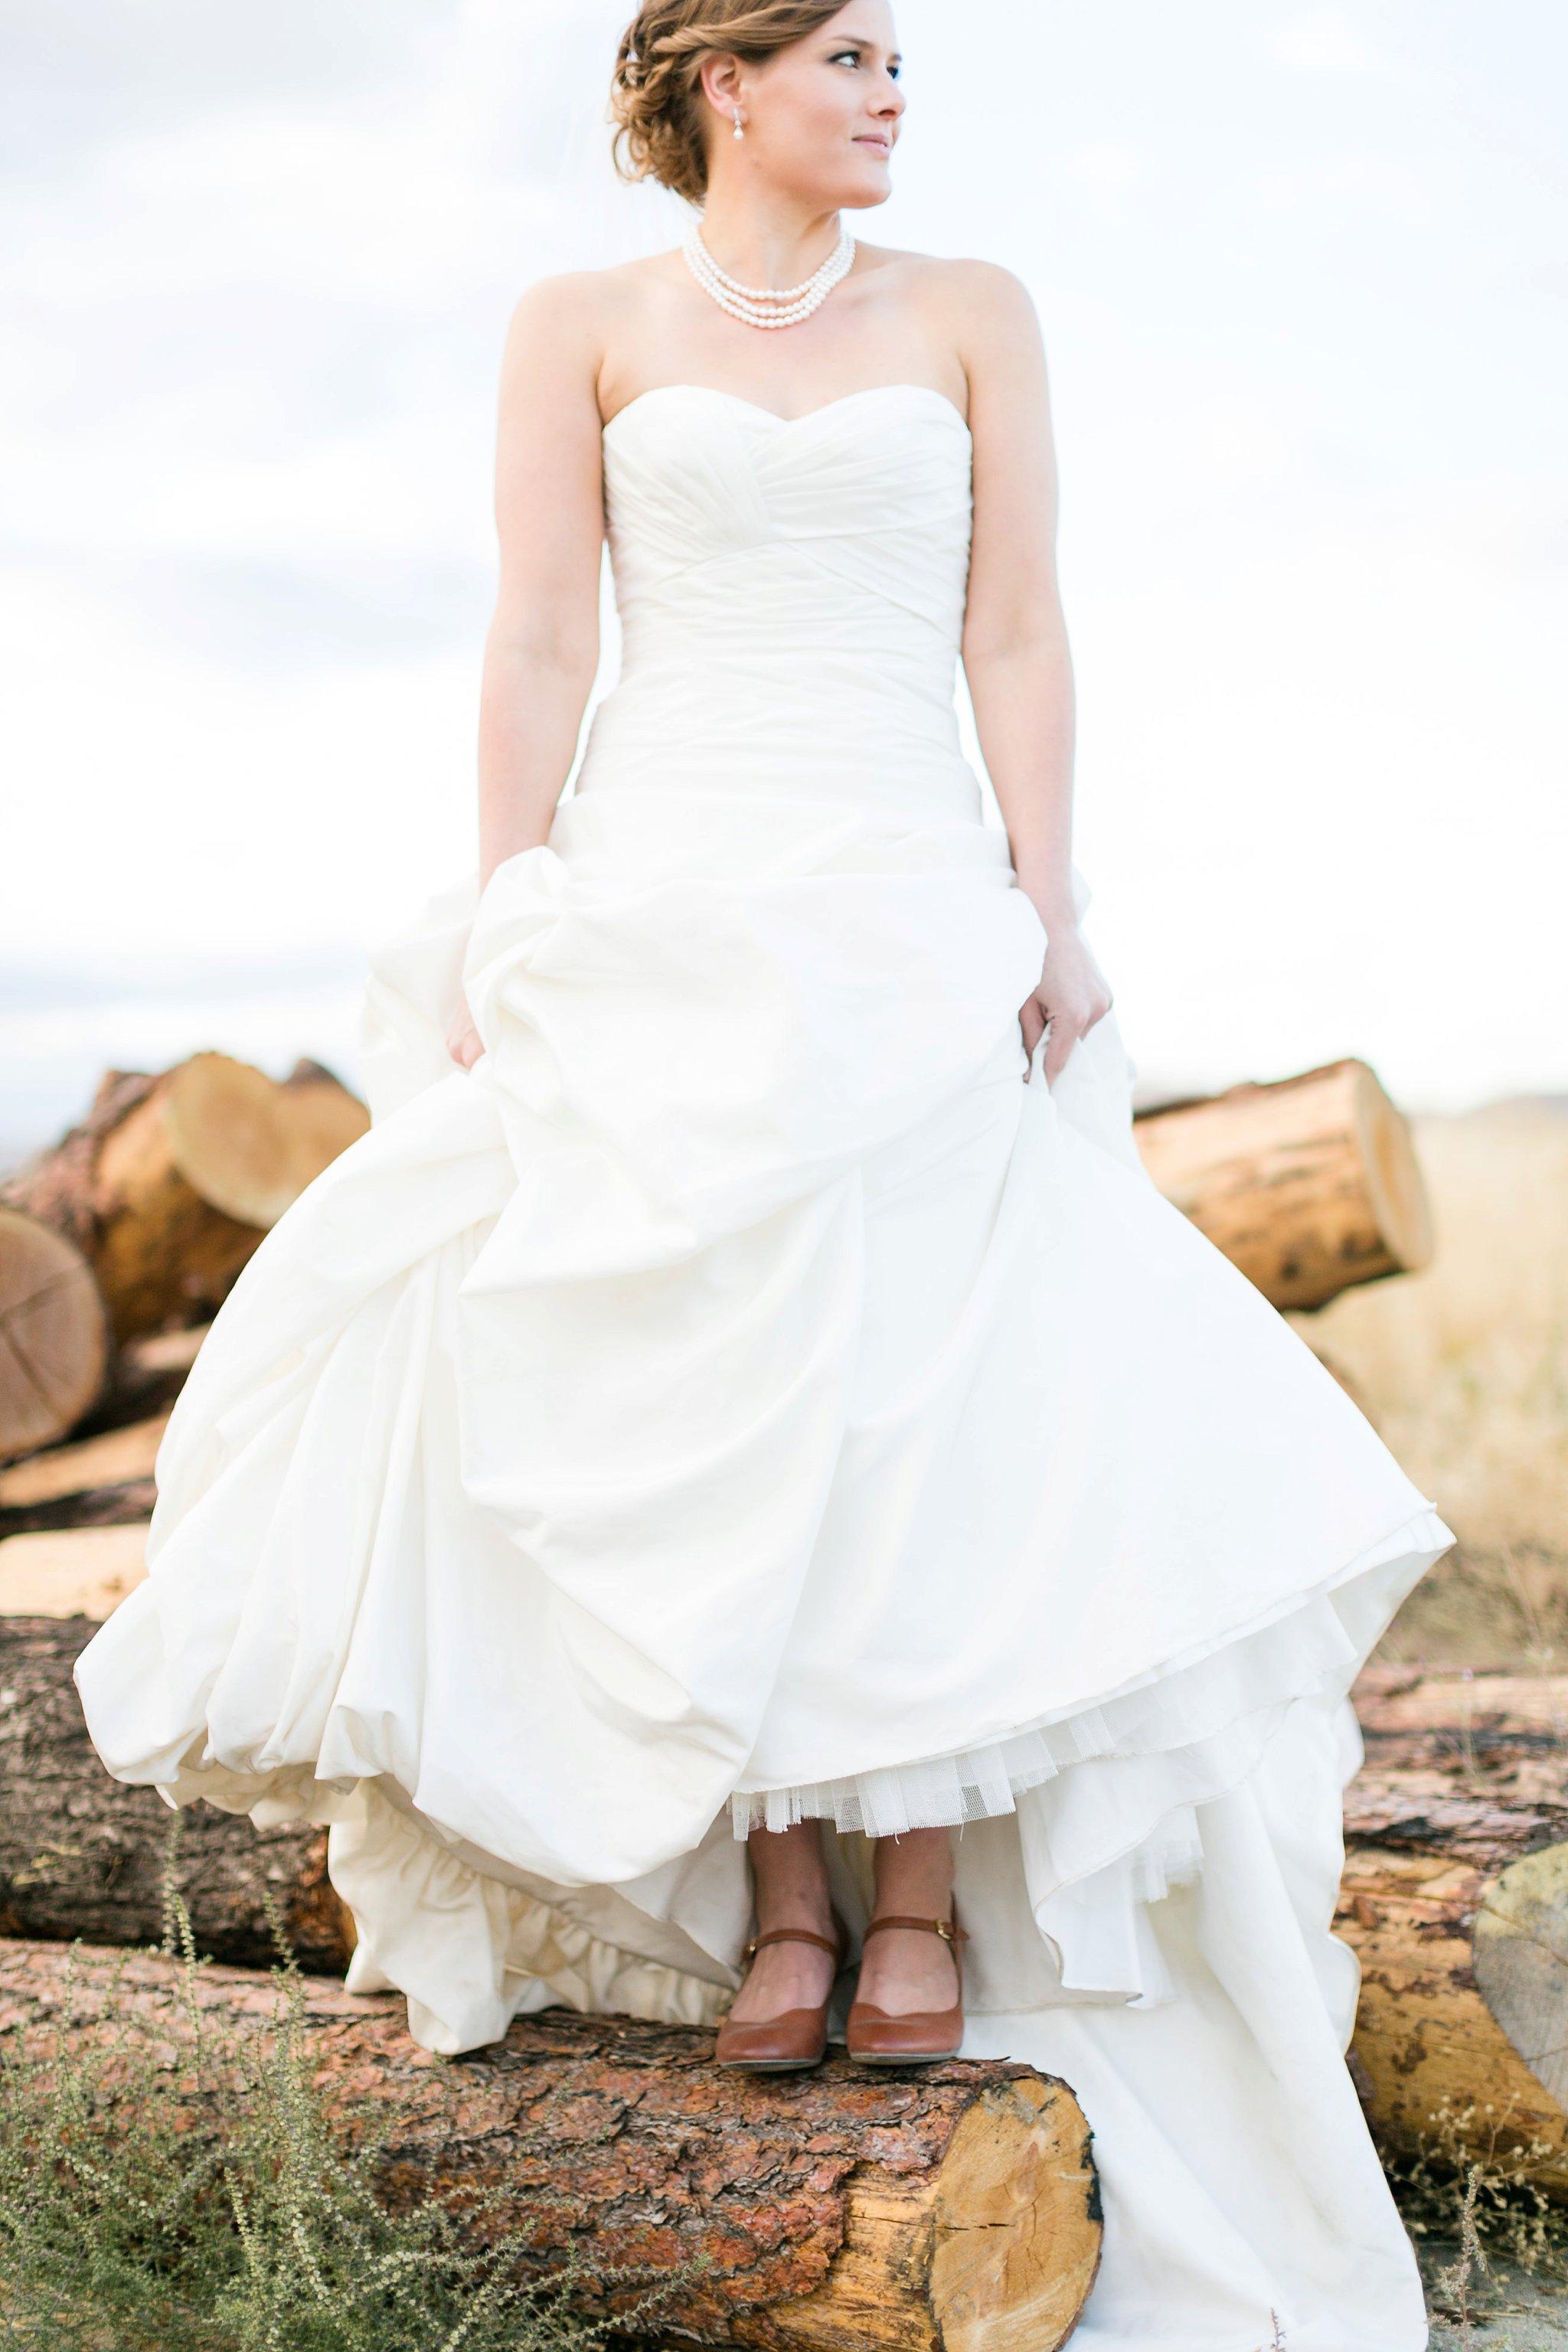 Chelan Washington Wedding Photos Megan Kelsey Photography Delight Wedding Workshop Styled Shoot Annalee & Scot-168.jpg